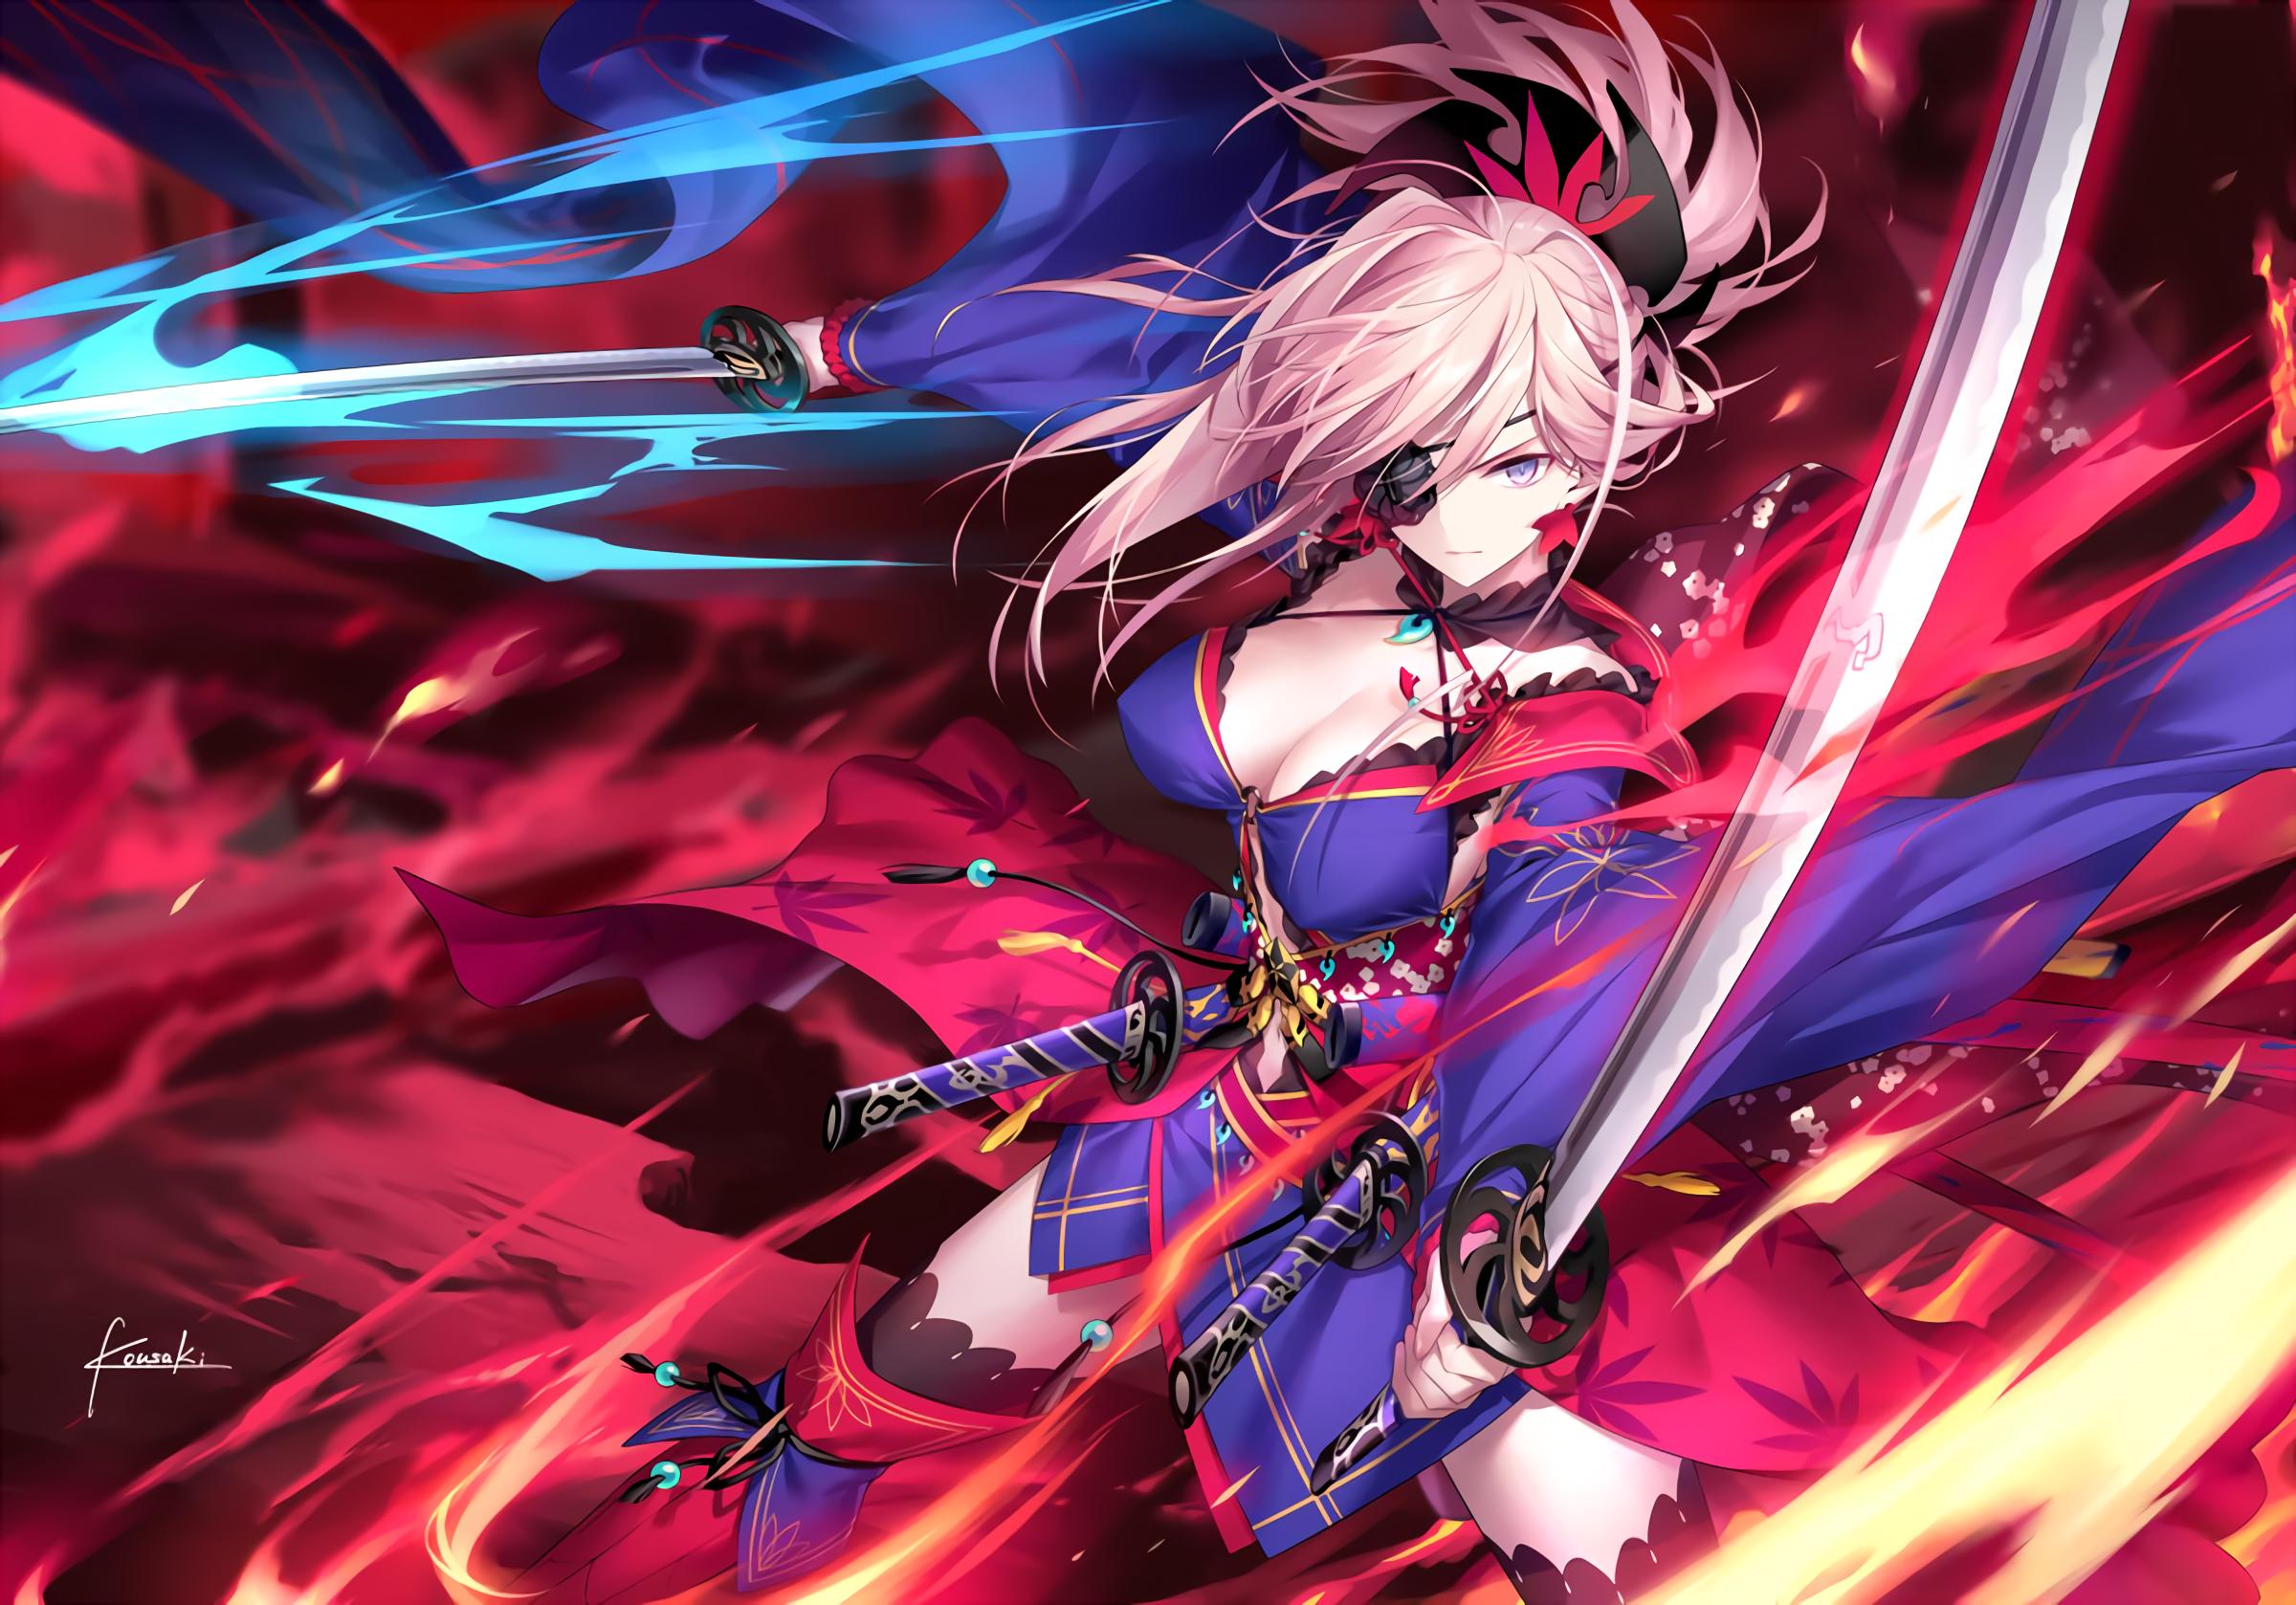 30 Miyamoto Musashi HD Wallpapers Background Images   Wallpaper 2400x1678